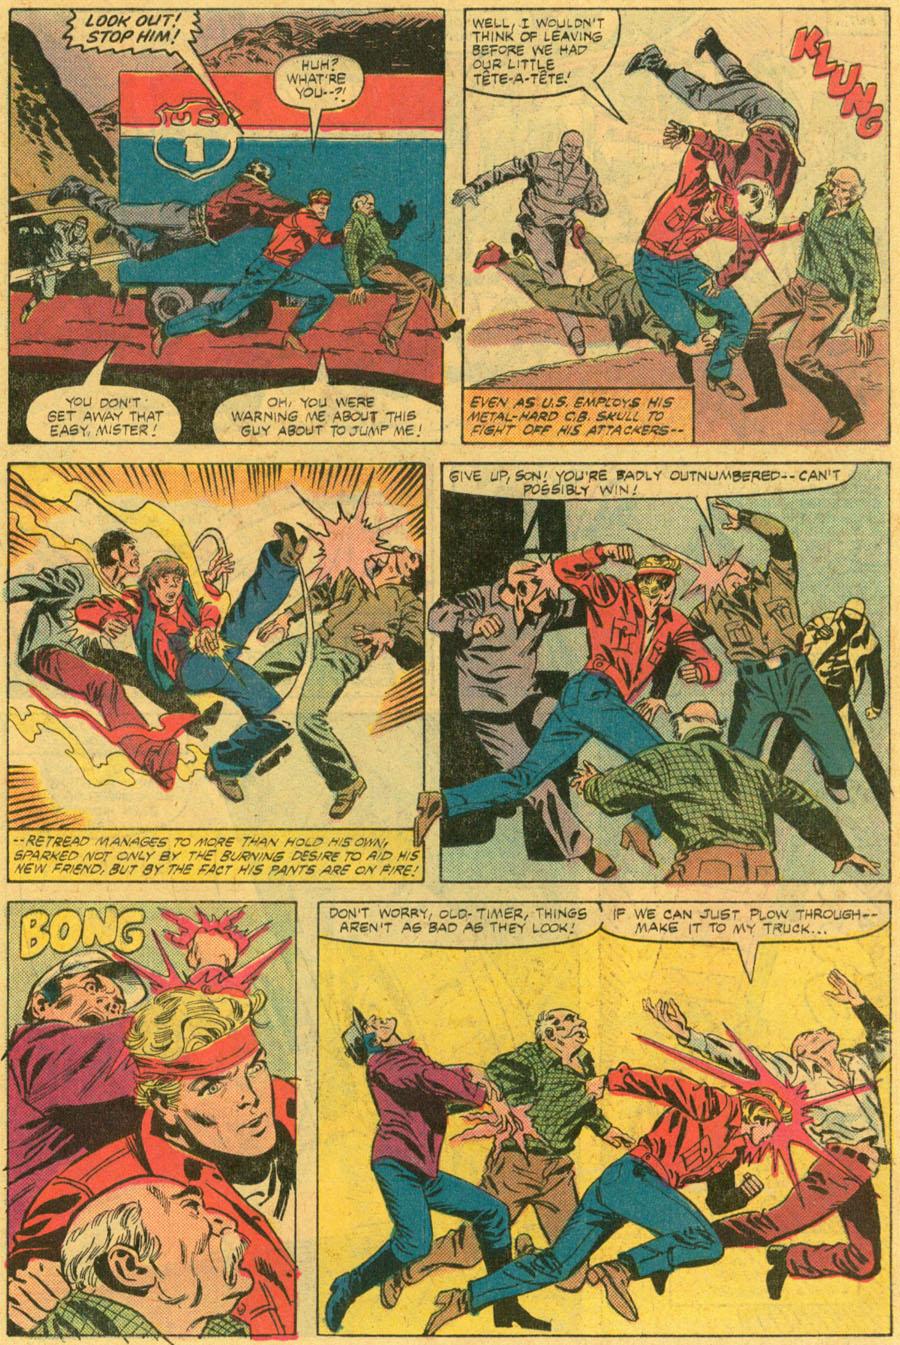 Read online U.S. 1 comic -  Issue #3 - 20